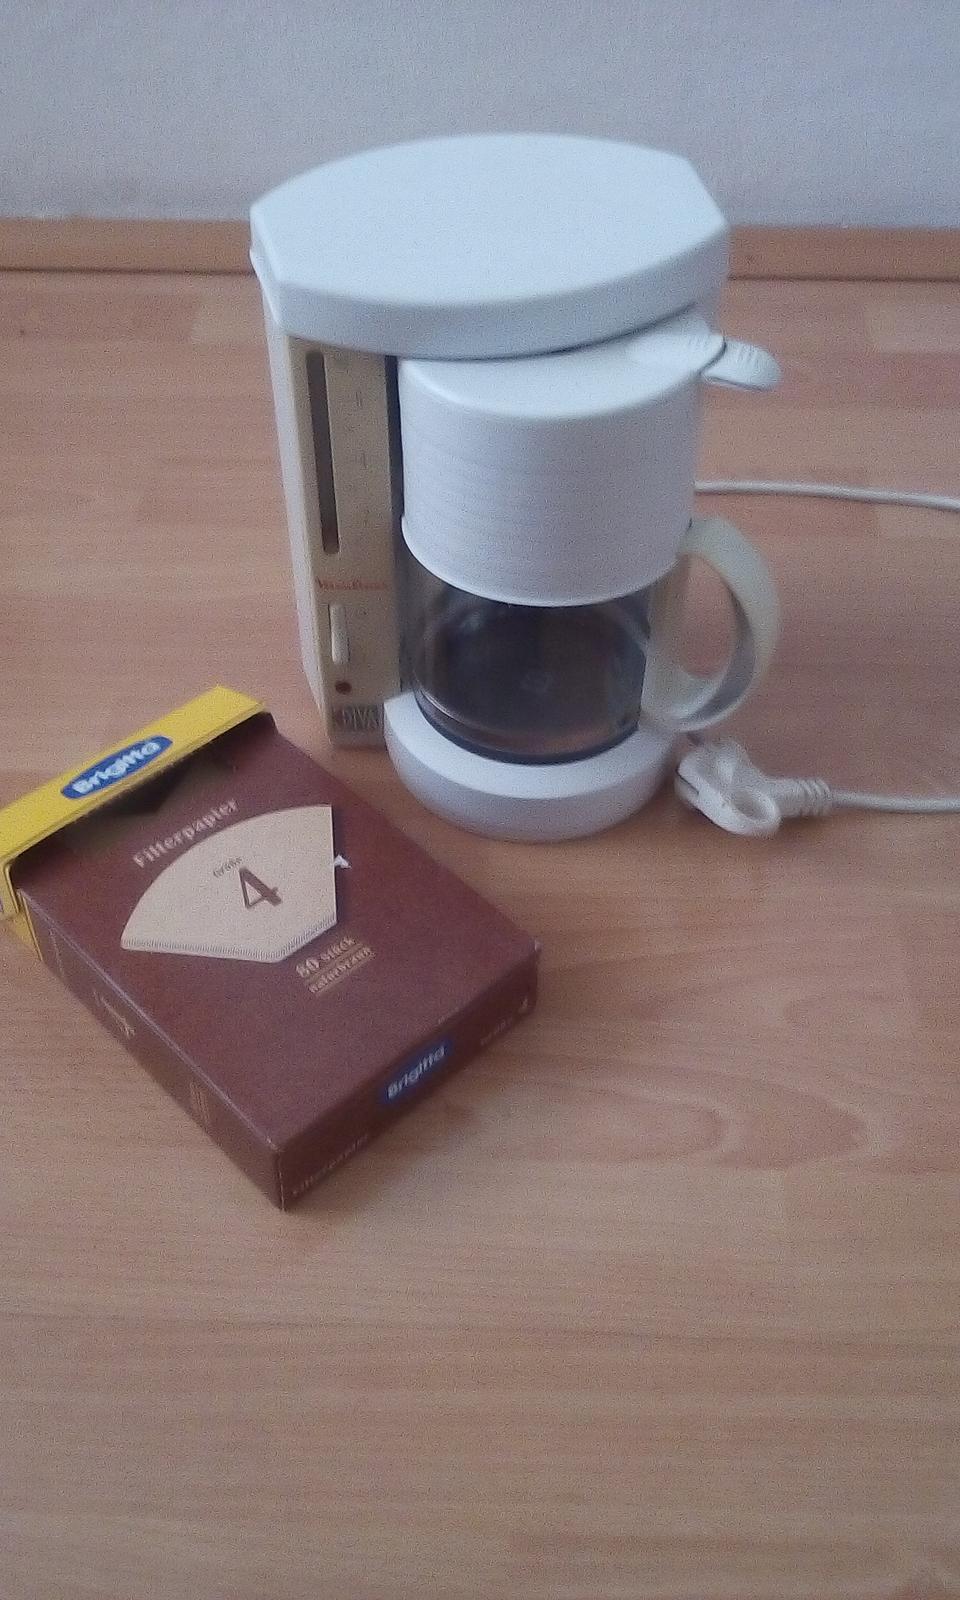 kavovar+darcek - Obrázok č. 1